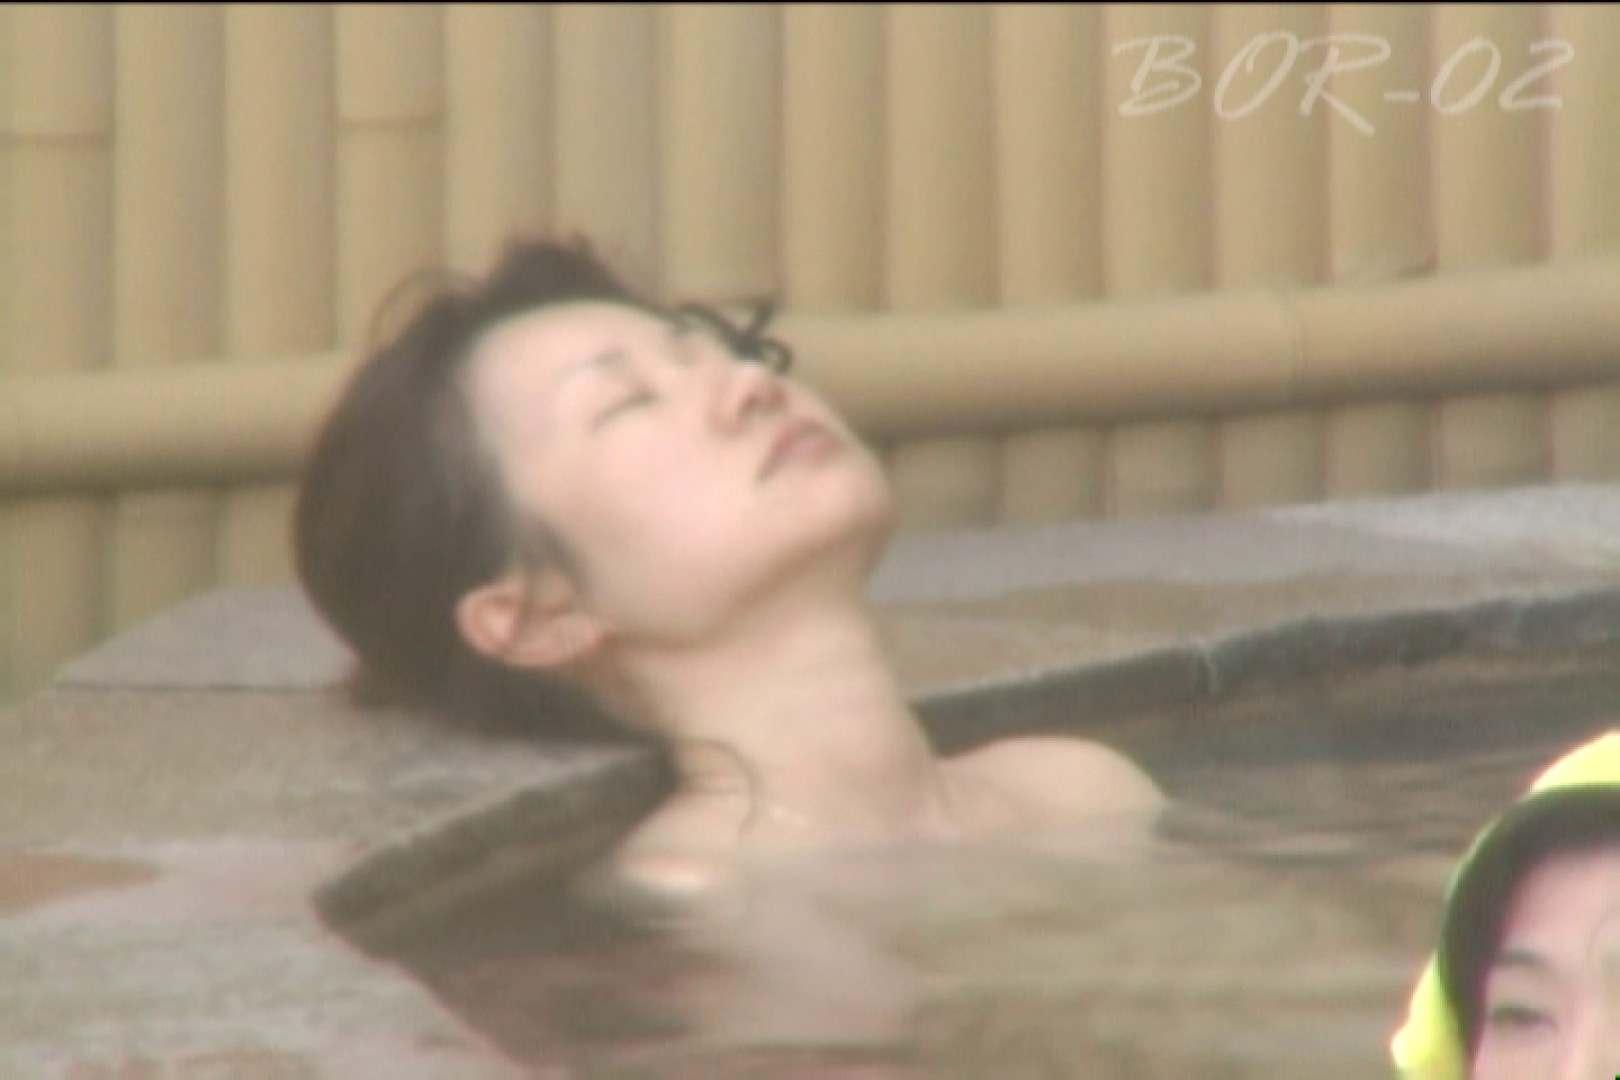 Aquaな露天風呂Vol.477 露天 アダルト動画キャプチャ 99PICs 26